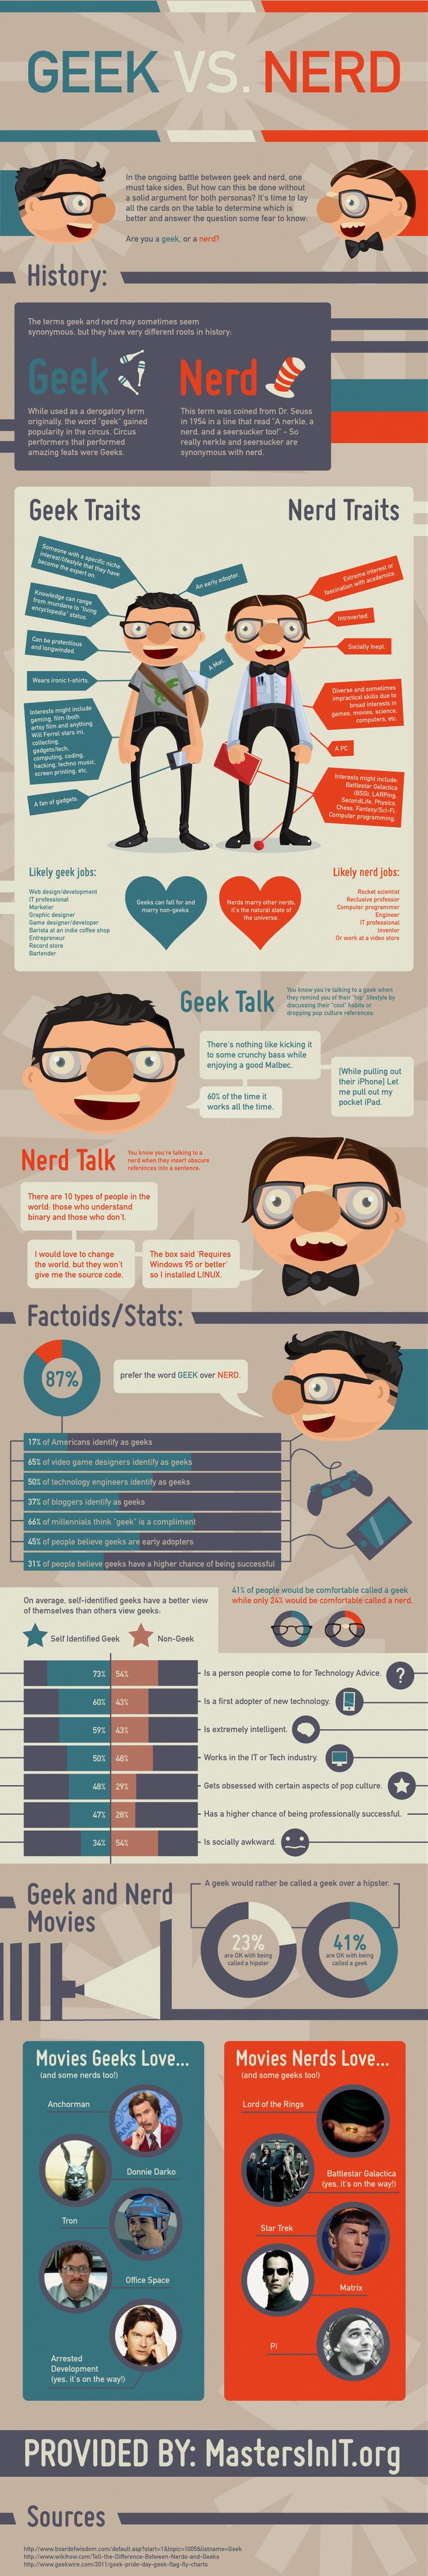 I Can't Decide If I'm A Nerd Or A Geek; Maybe It's The Gender Bias | Herstory | Scoop.it